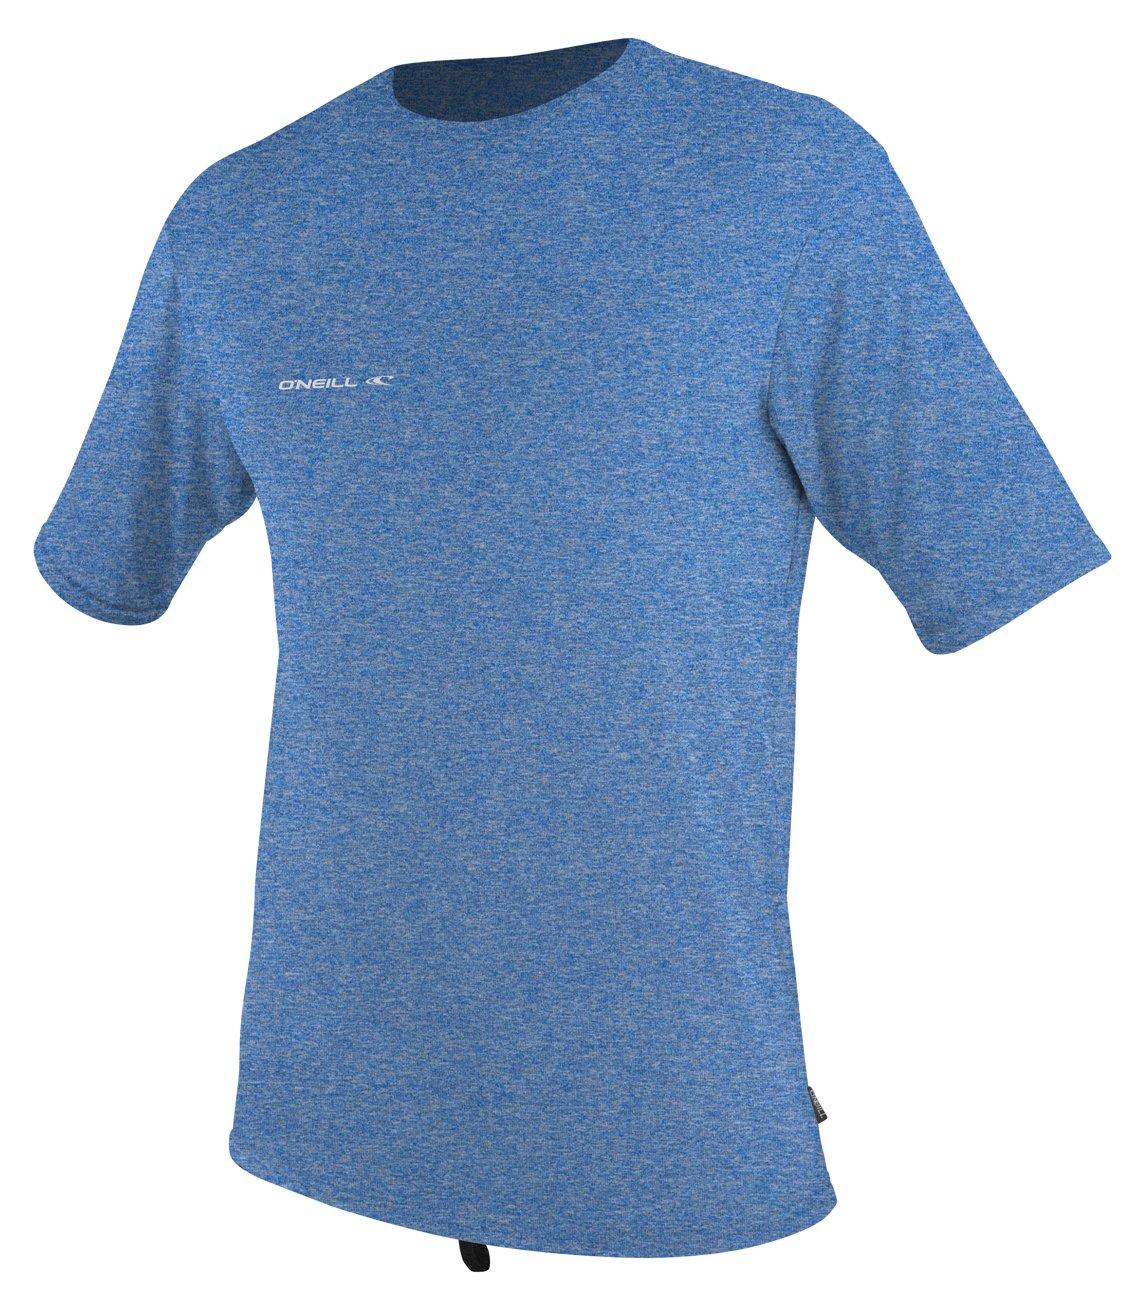 O'Neill  Men's Hybrid UPF 50+ Short Sleeve Sun Shirt, Blue,Small